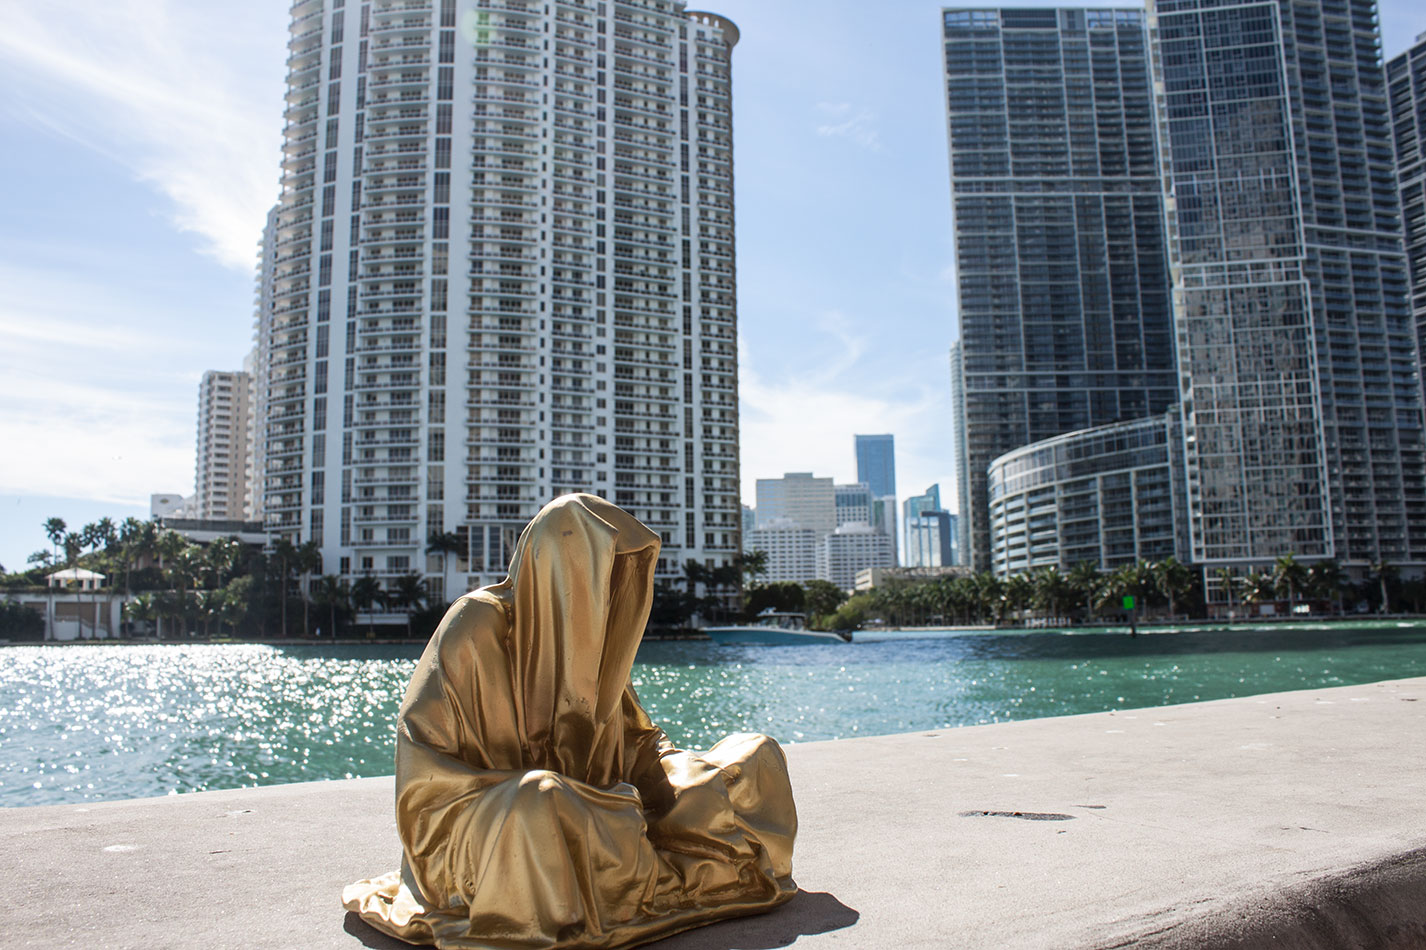 public-art-basel-miami-beach-fair-usa-florida-guardians-of-time-manfred-kili-kielnhofer-contemporary-fine-art-modern-arts-design-antiques-sculpture-6725